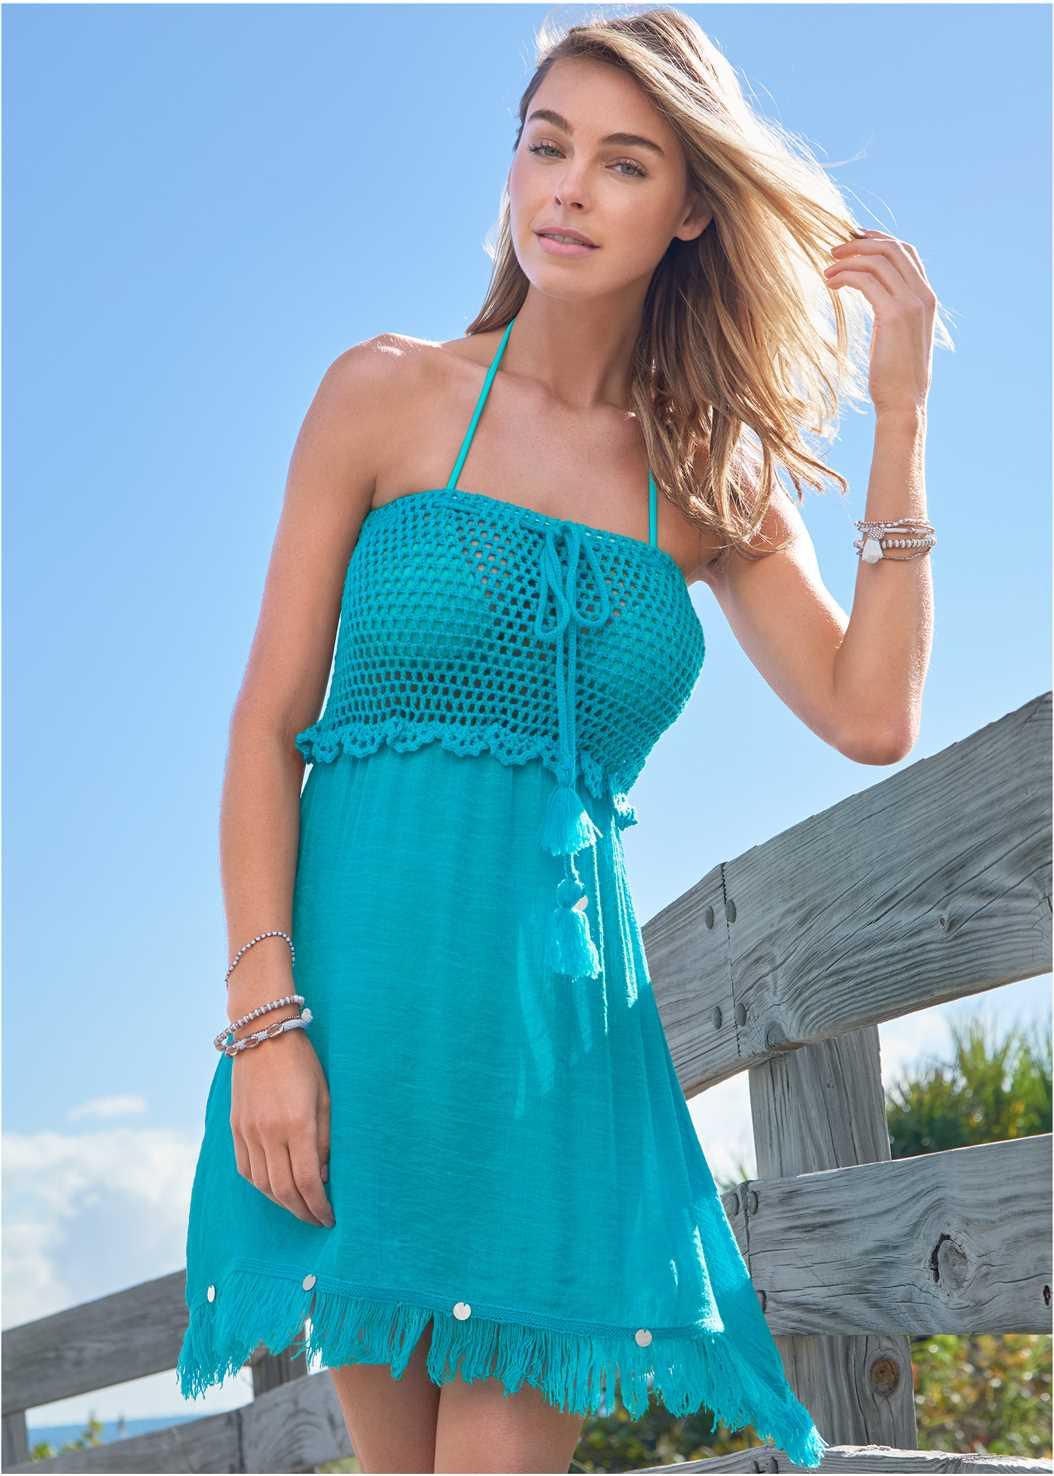 Crochet Cover-Up Dress,Underwire Wrap Top,Adjustable Side Swim Short,Slimming Ruffle One-Piece,Macrame Handbag